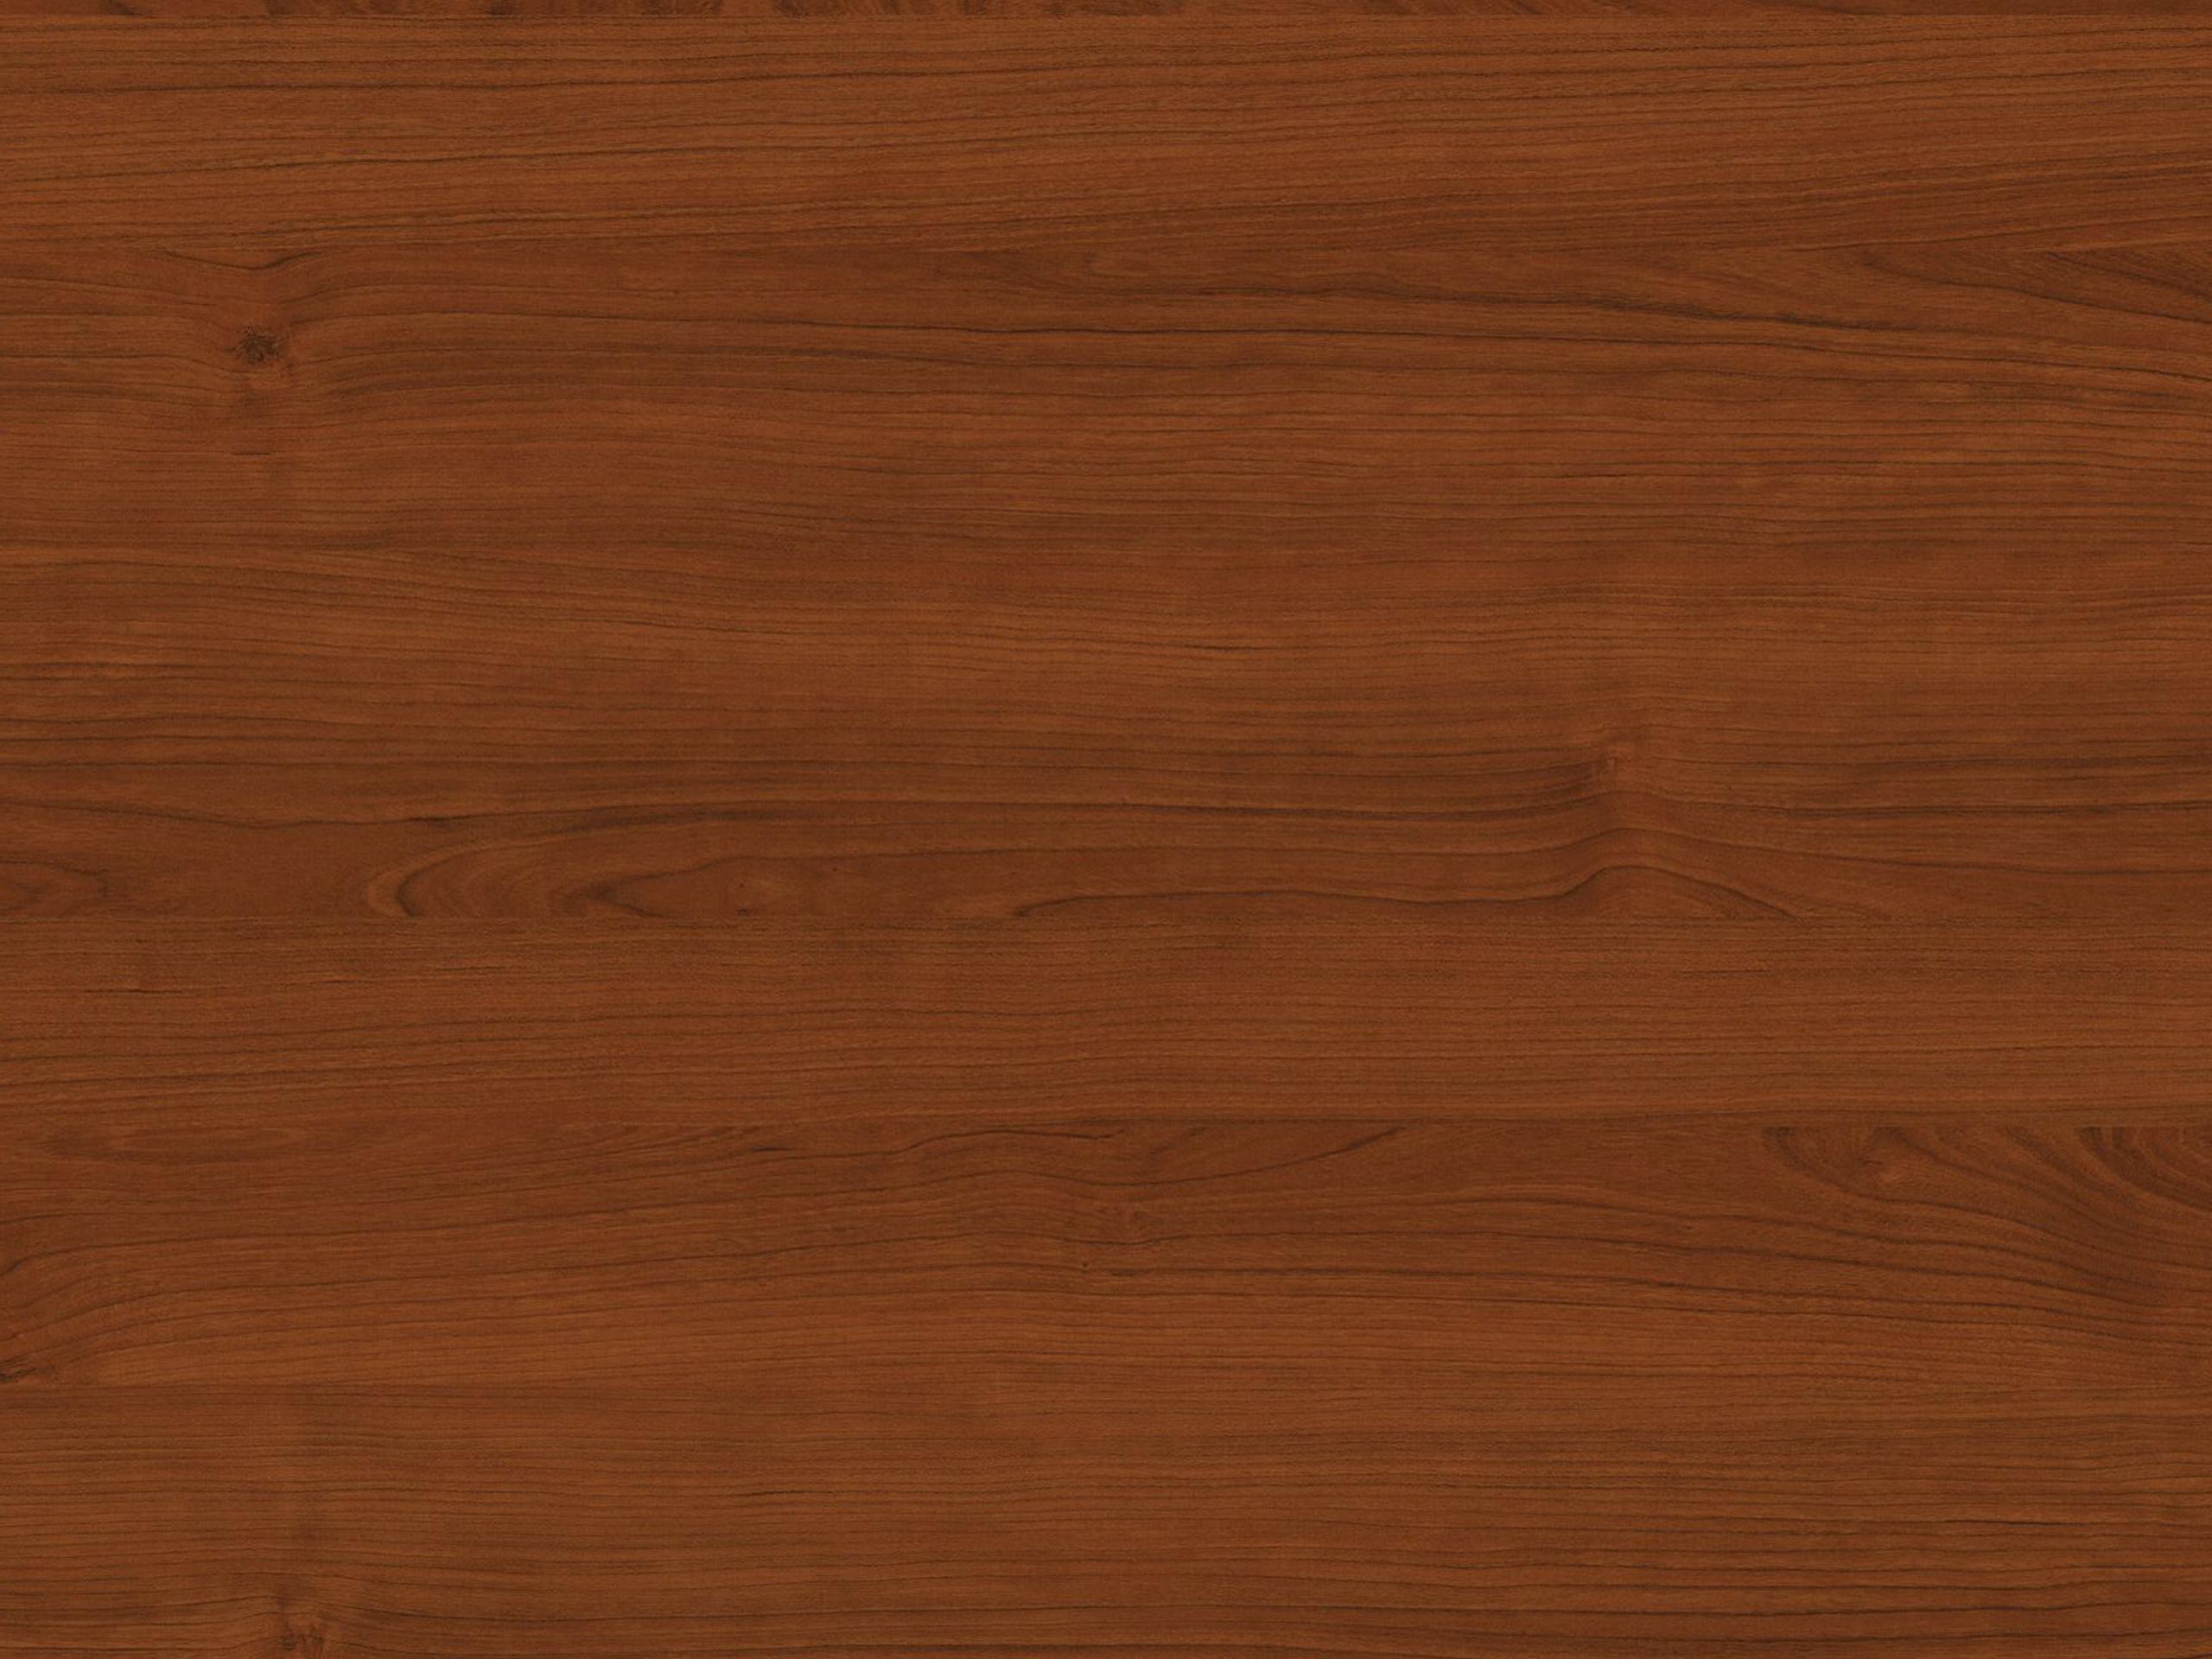 wood desk top view - photo #32